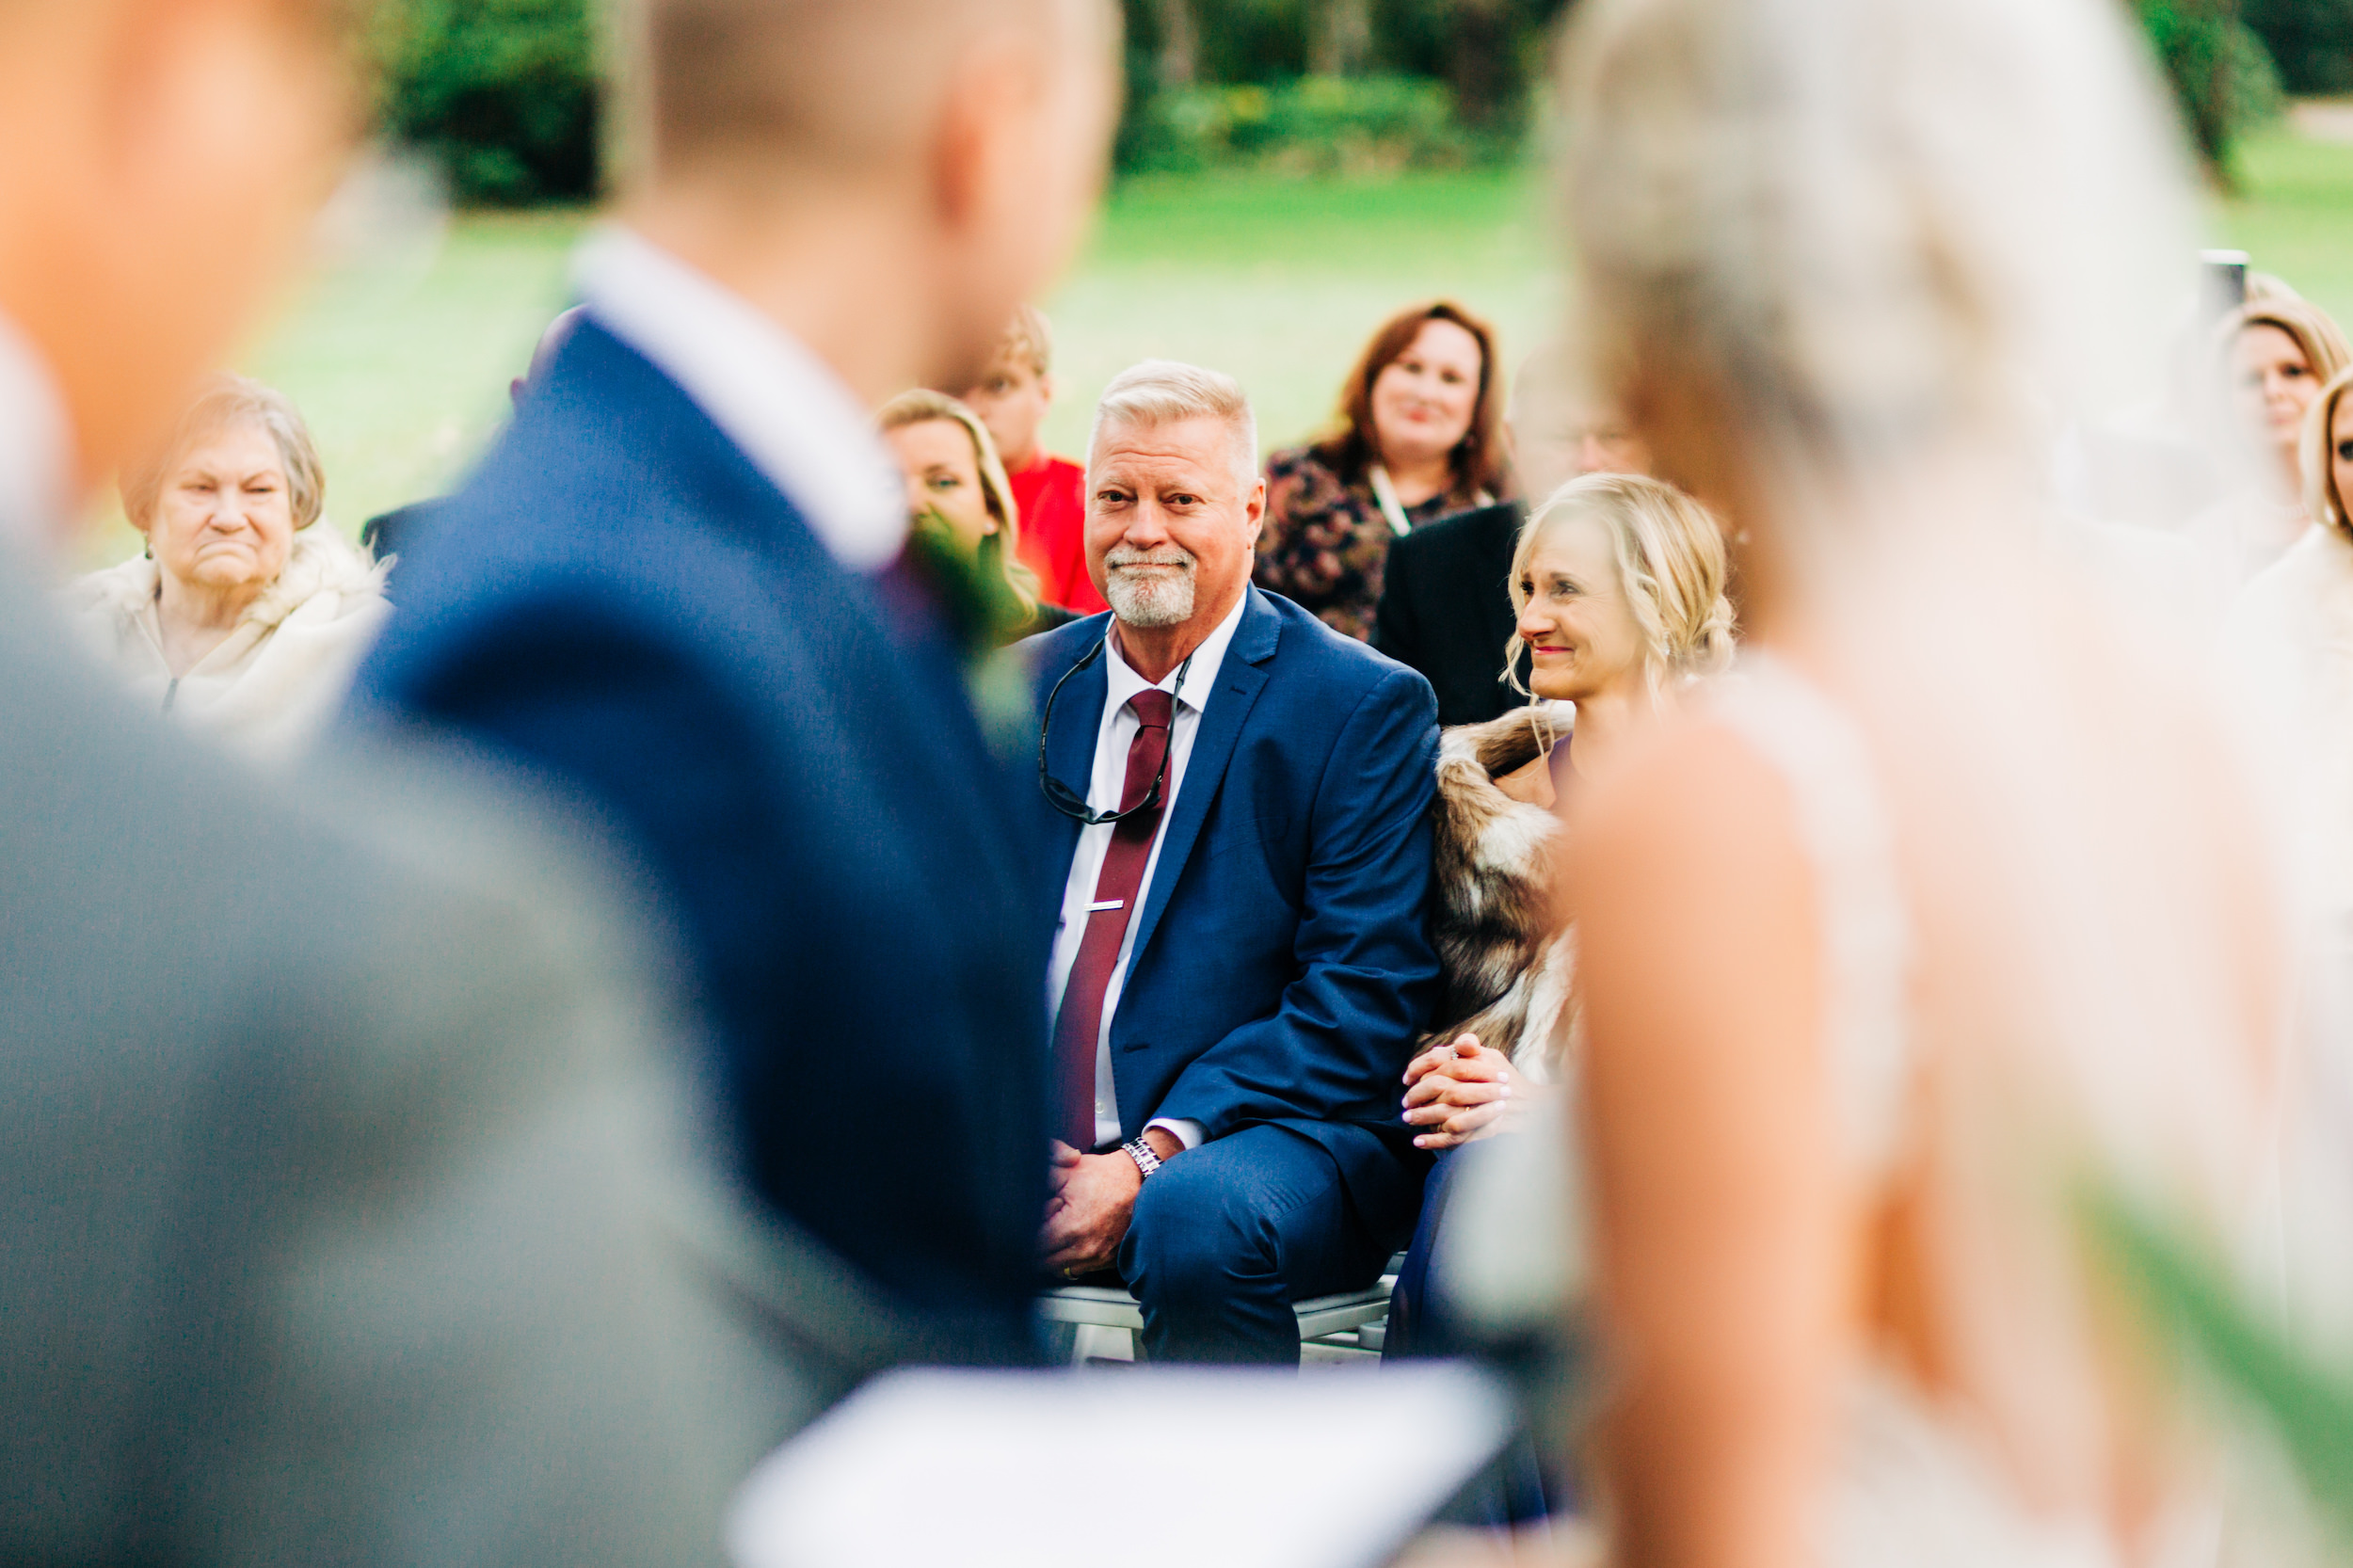 Ricky & Brittney - Ceremony - Jake & Katie Photography_105.jpg